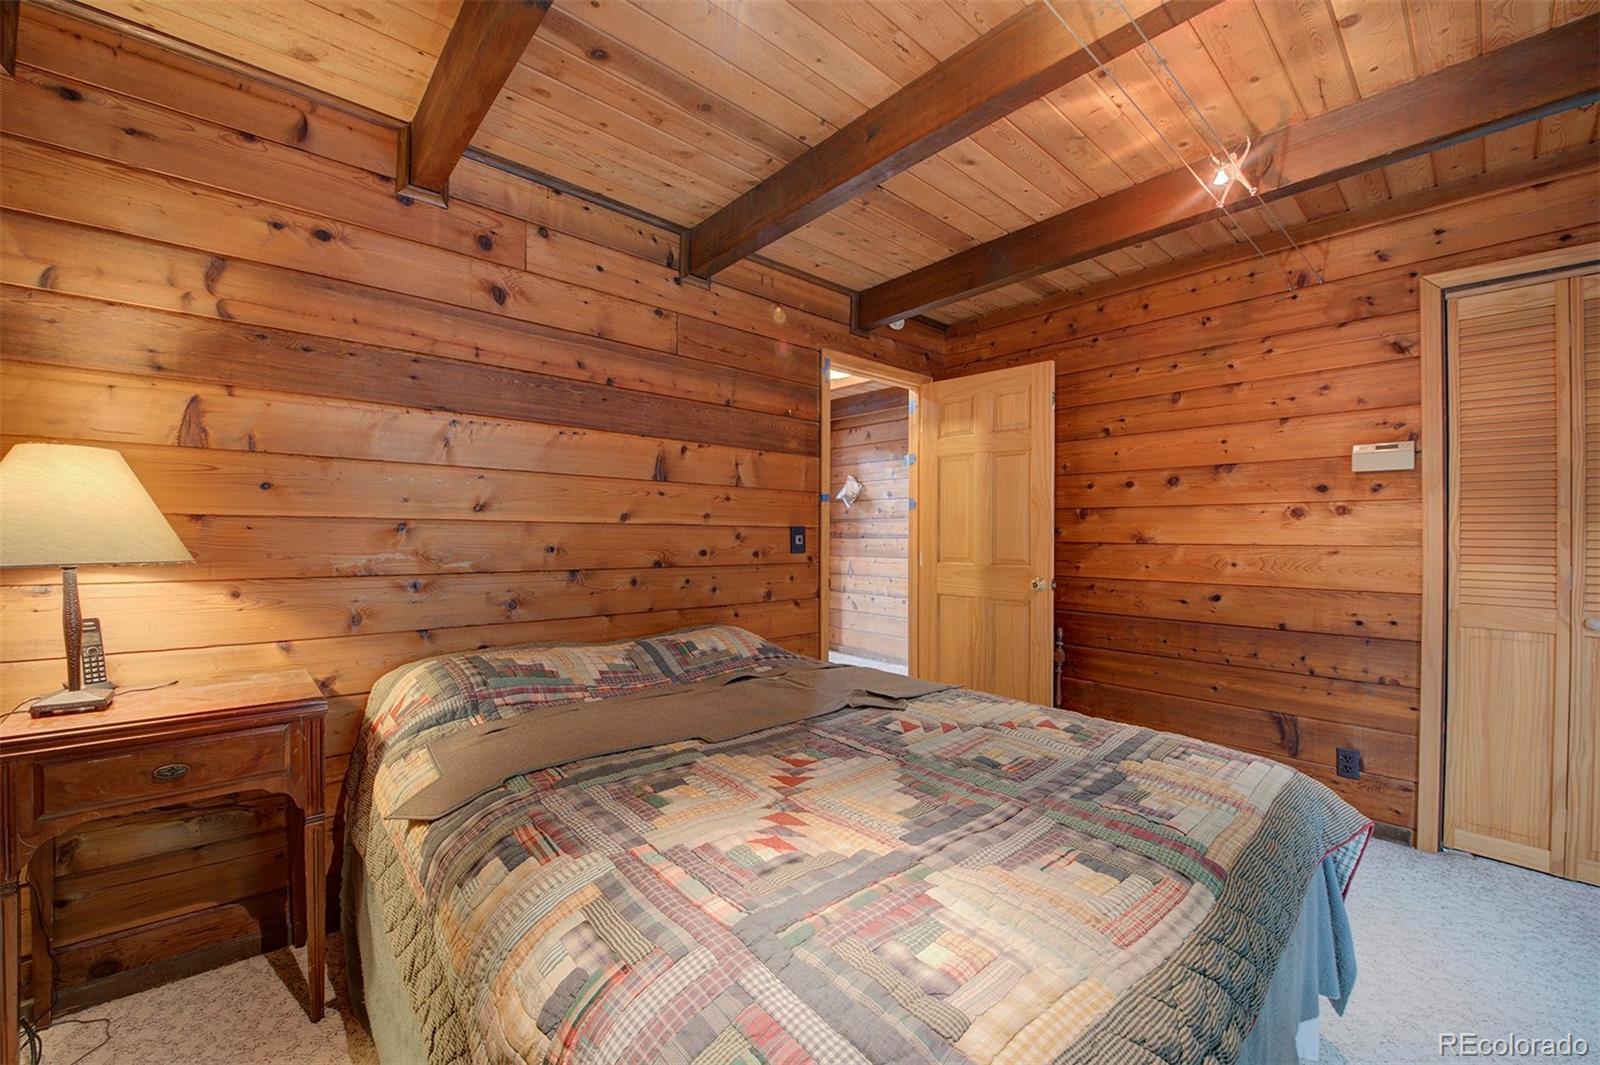 MLS# 6922377 - 24 - 12123 Geronimo Trail, Conifer, CO 80433